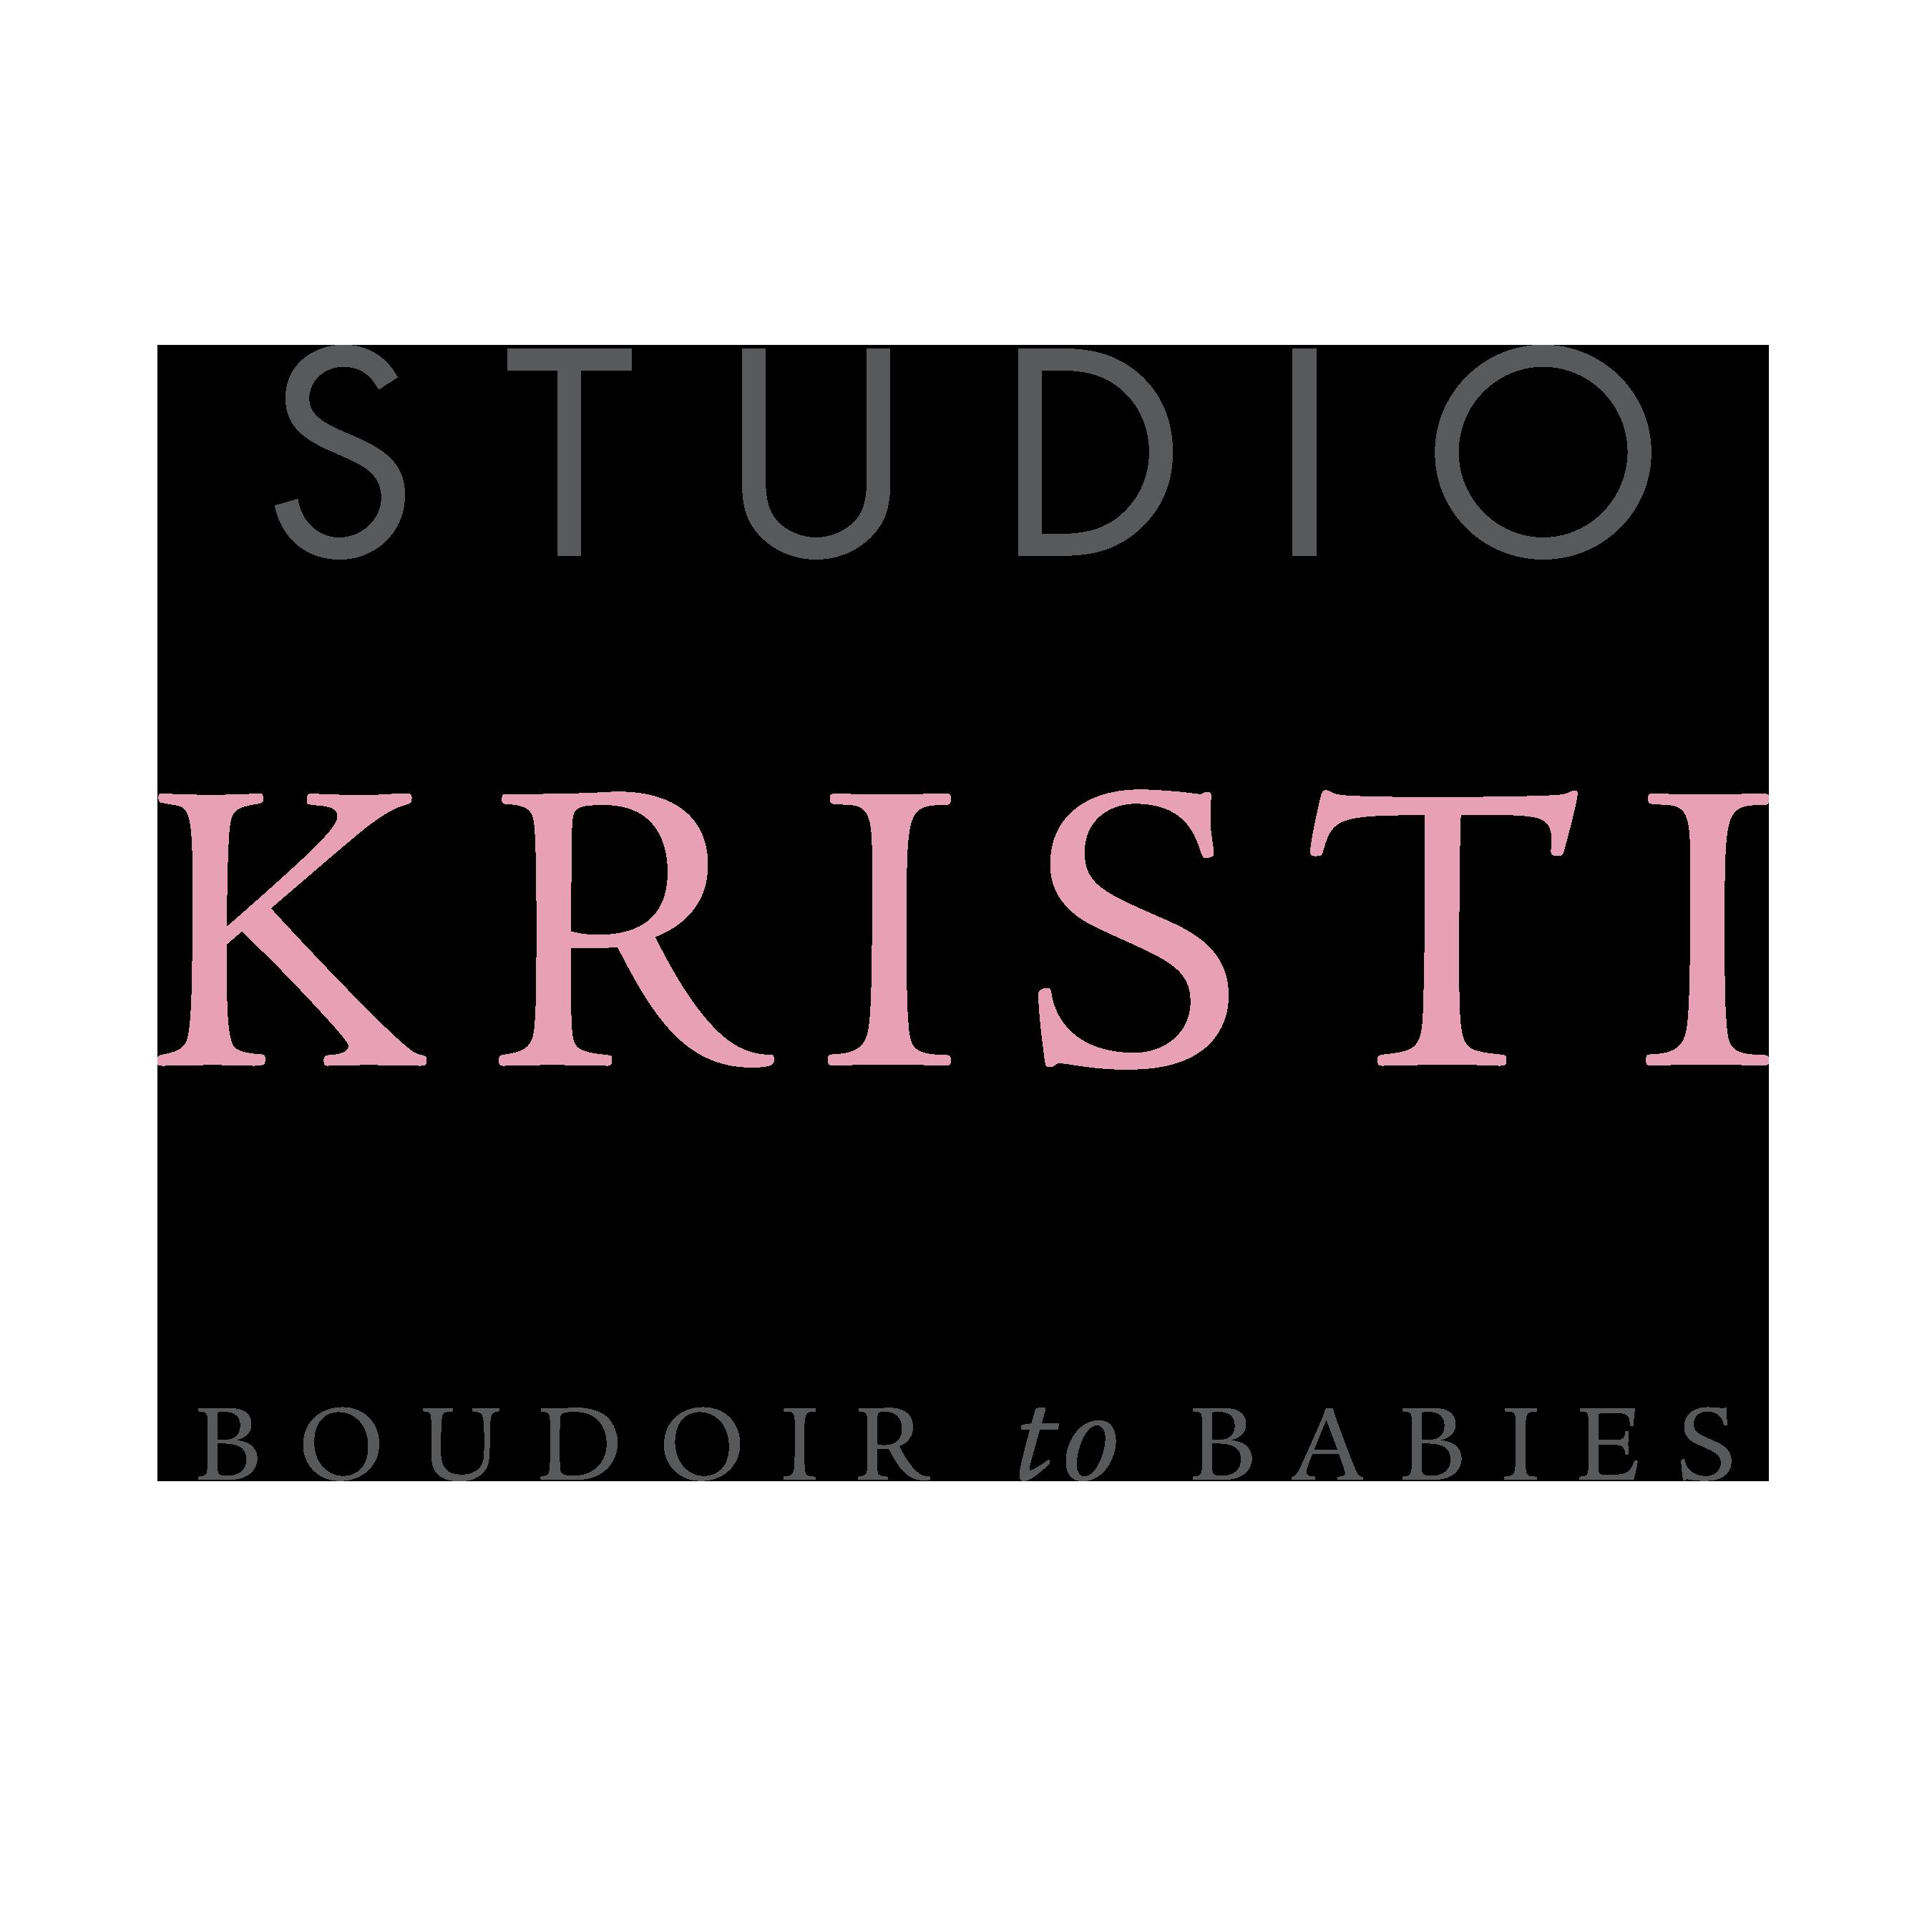 Studio Kristi - Boudoir to Babies